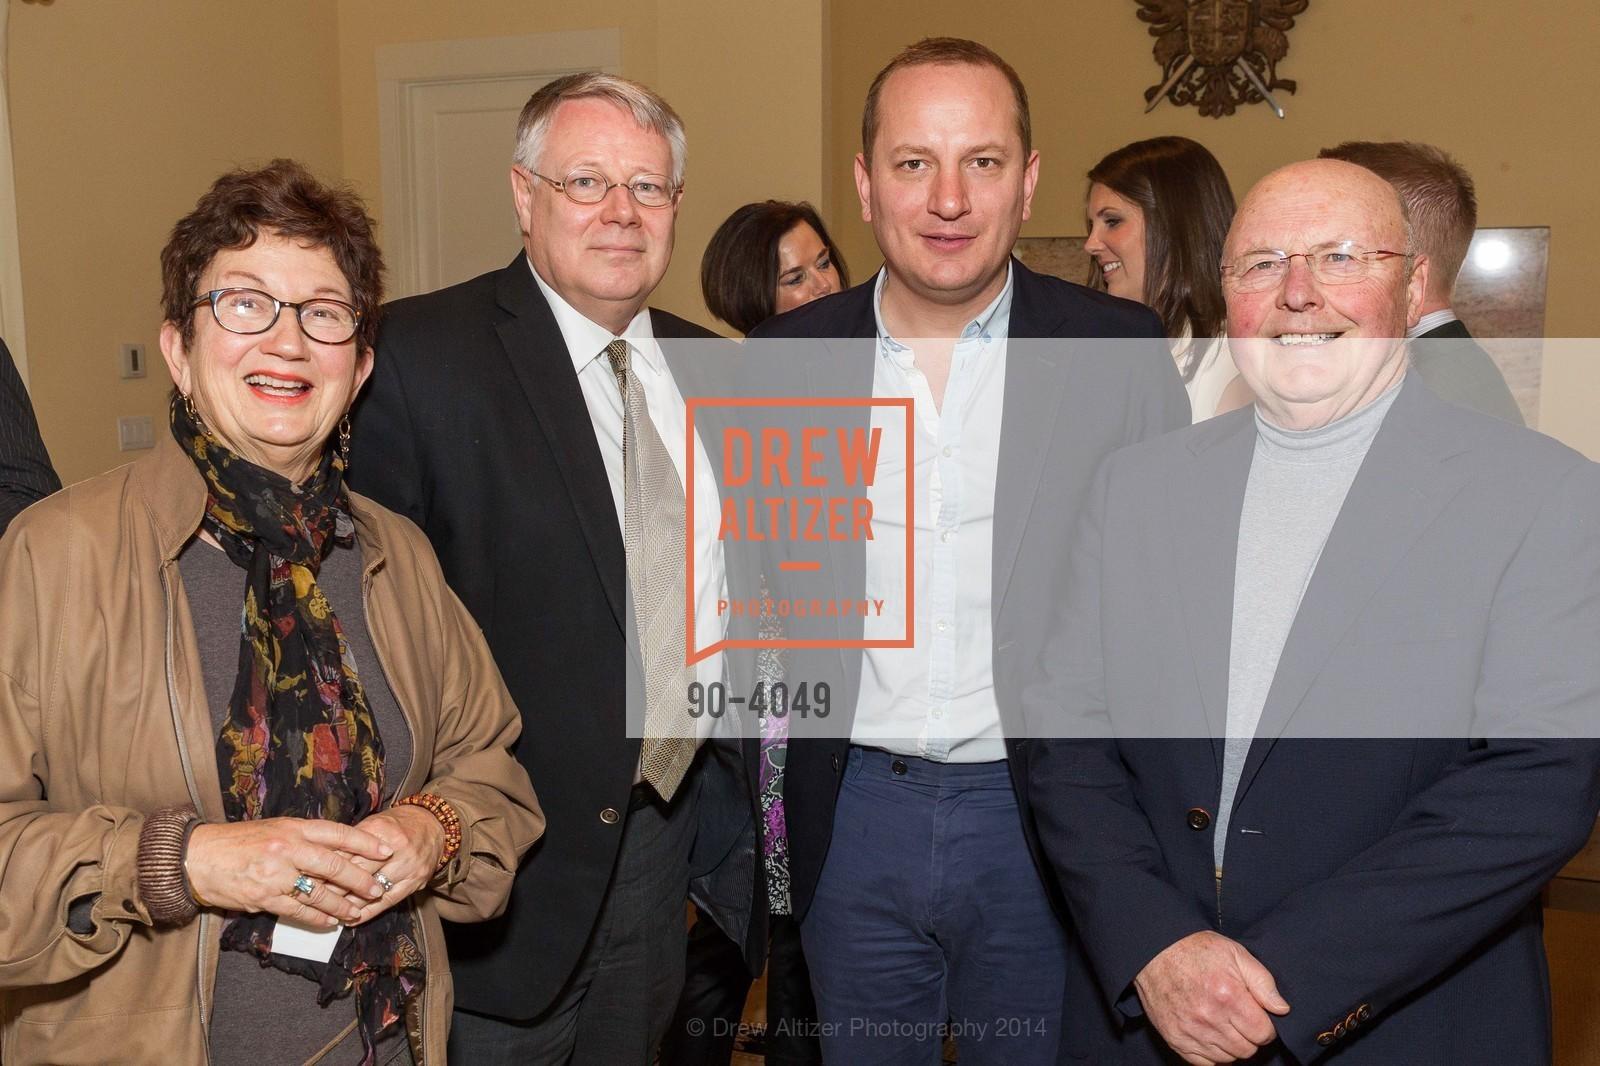 Joan DePaoli, Karl Backus, Florian Idenburg, Alex DePaoli, Photo #90-4049